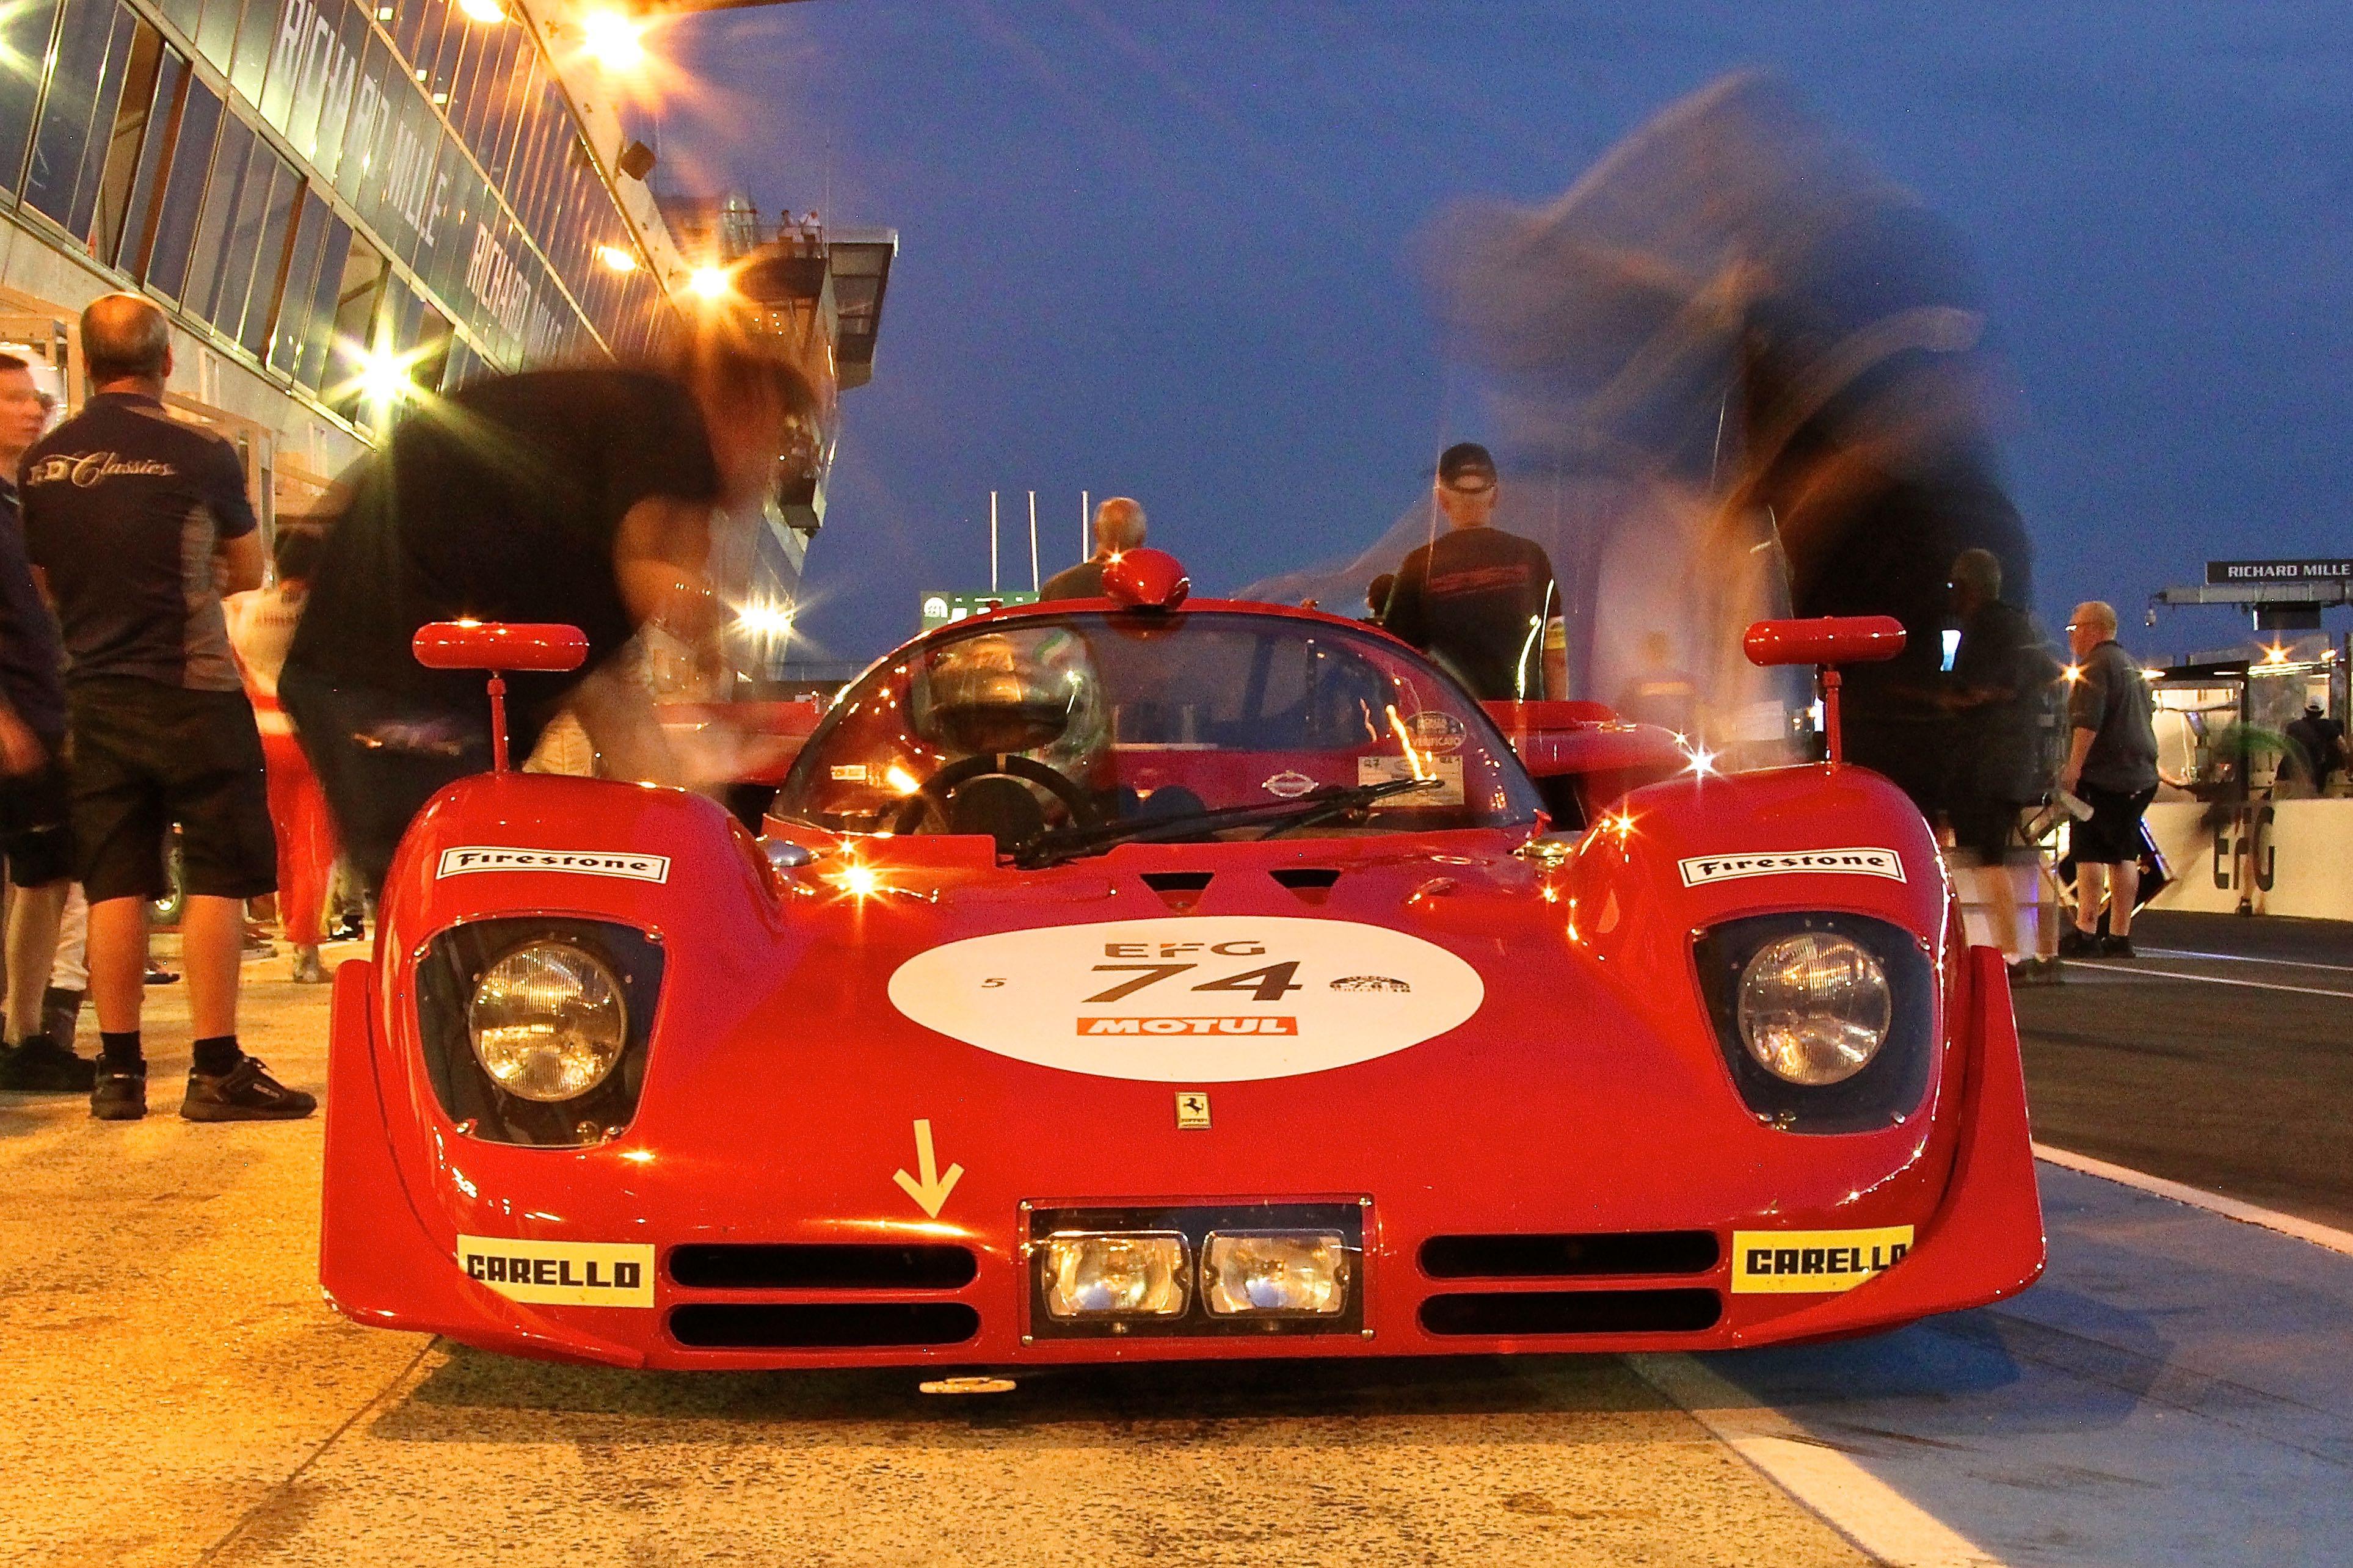 Ferrari 512 S - 1970 - Le Mans Classic 2018 - photo Ludo Ferrari